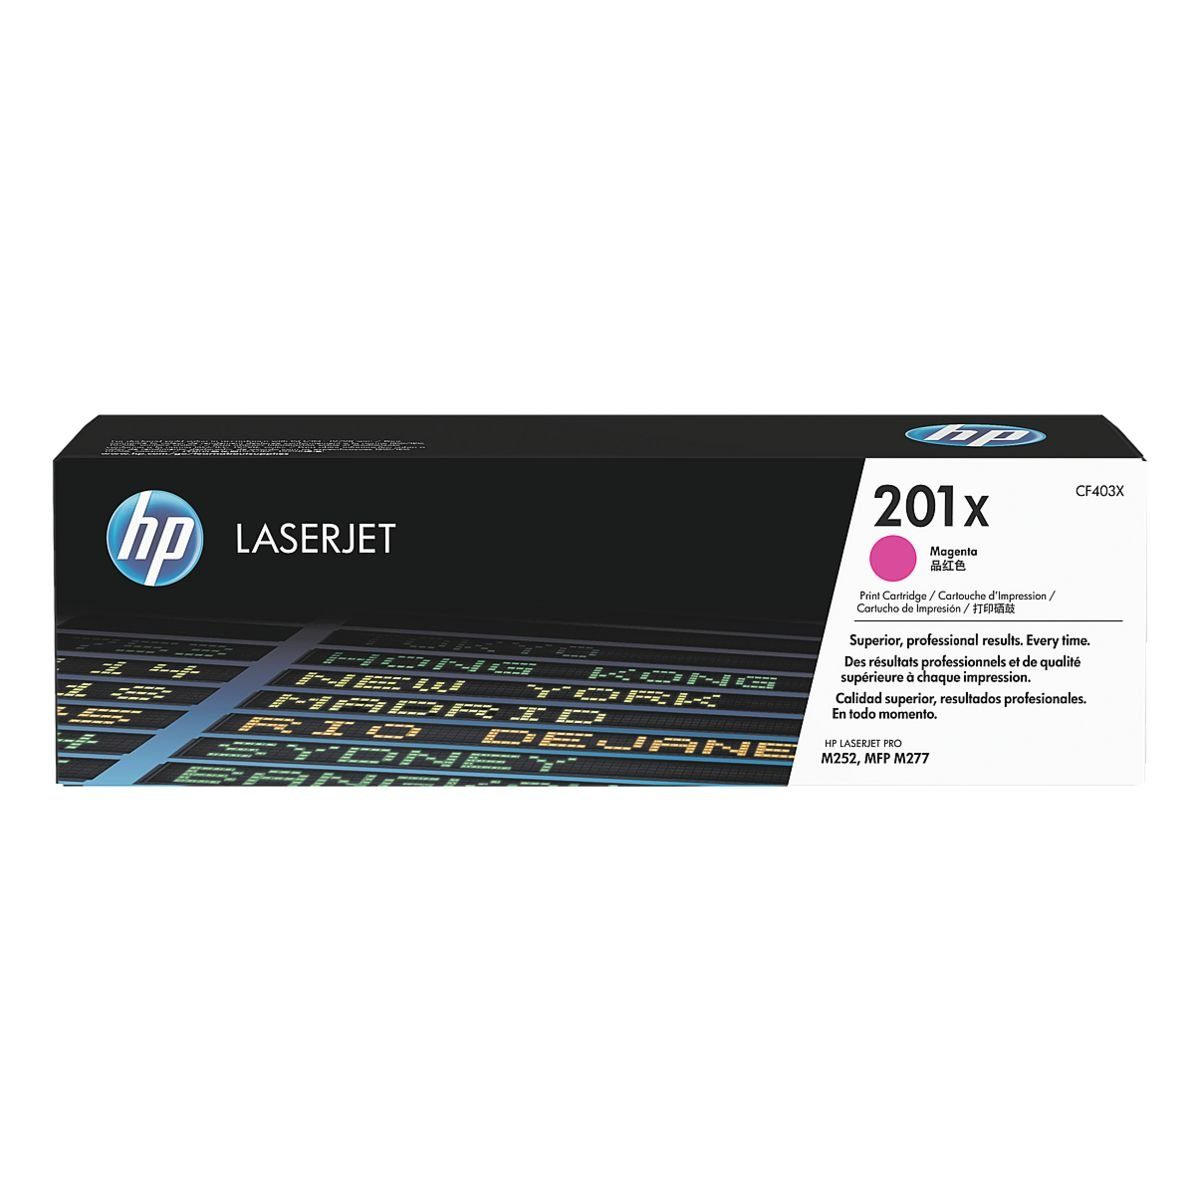 HP Druckkassette »HP CF403X« HP 201X